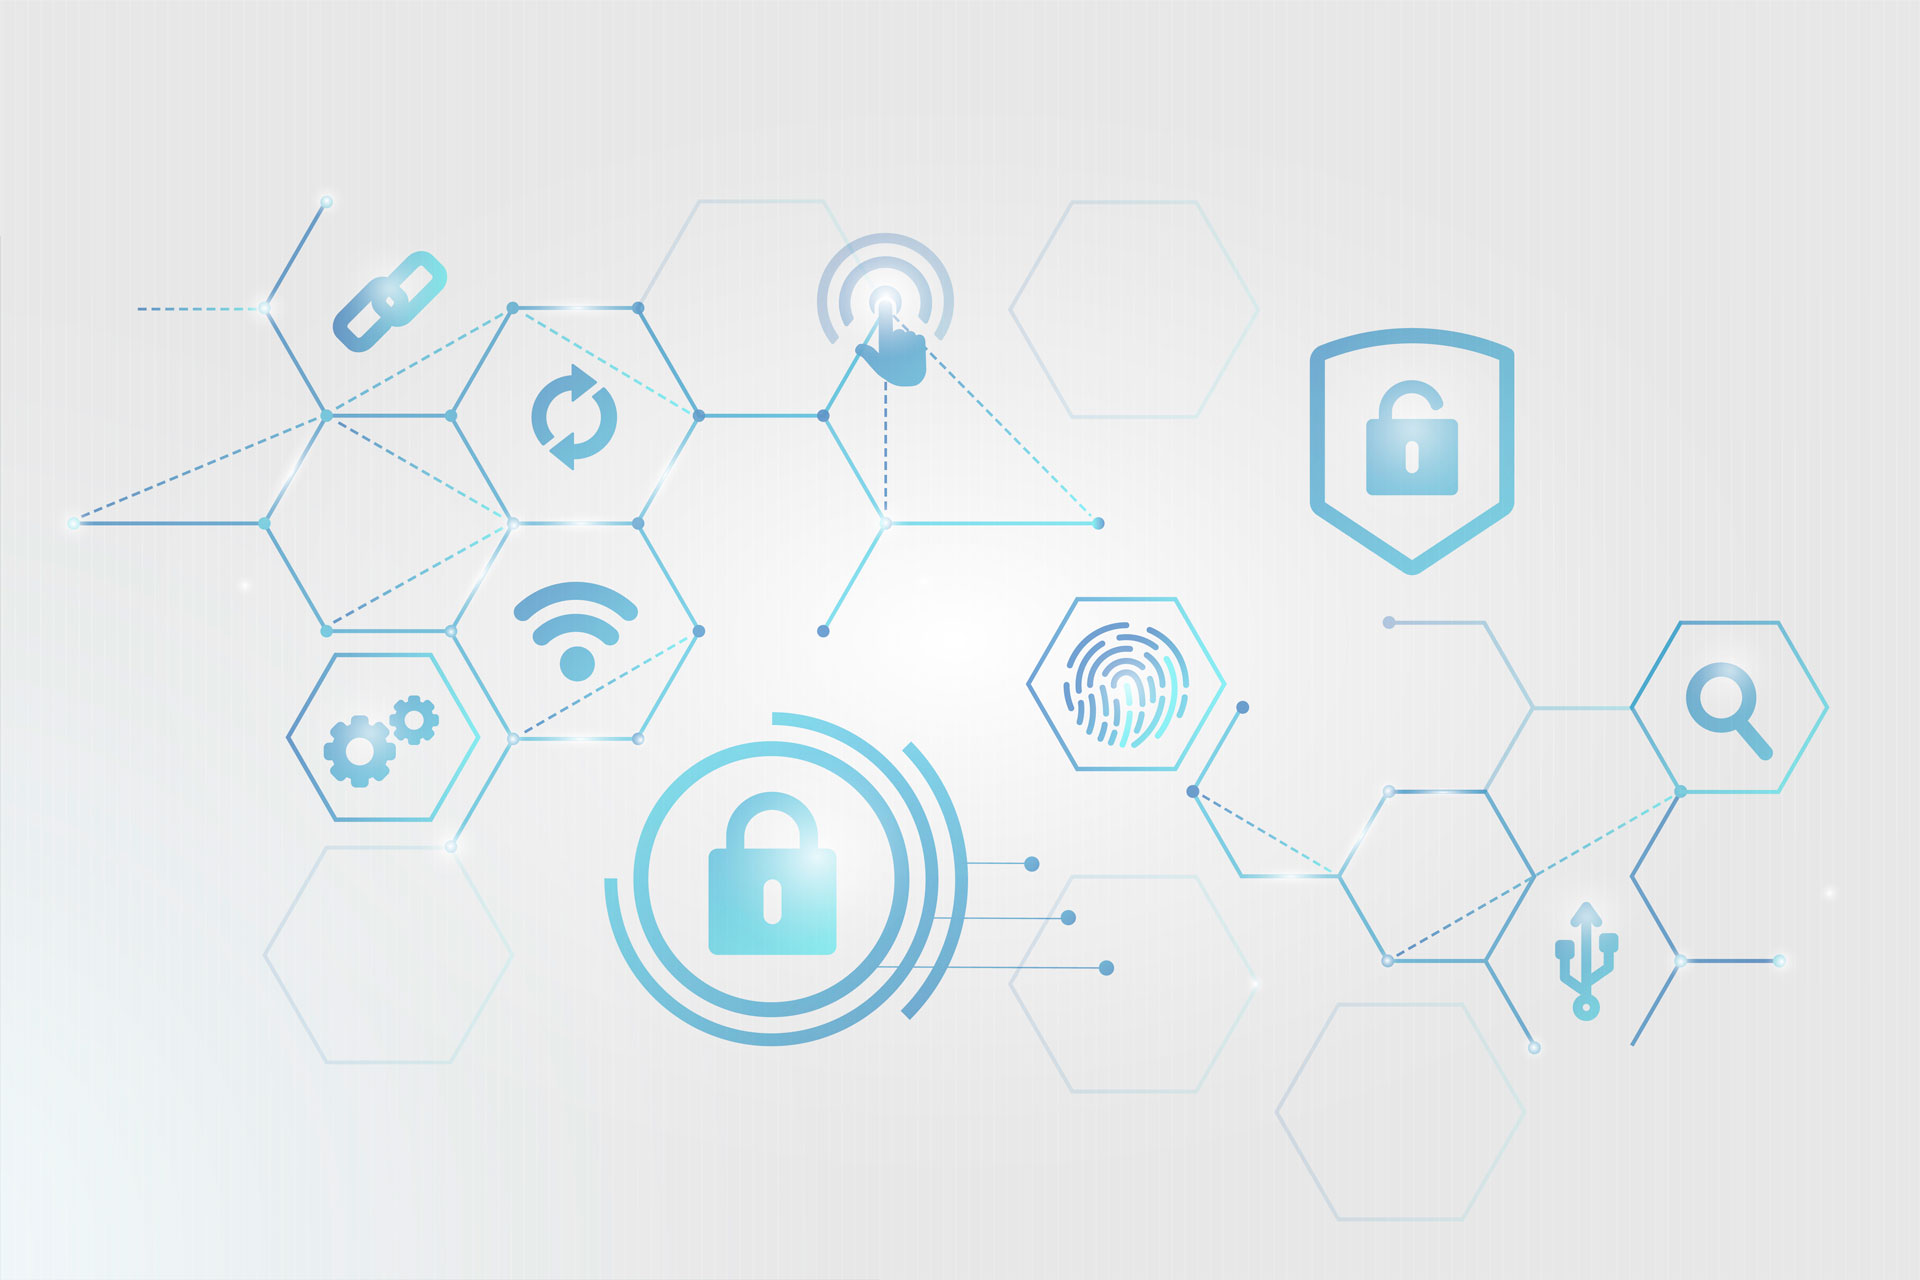 Primer Concurso de Ciberseguridad del IZV